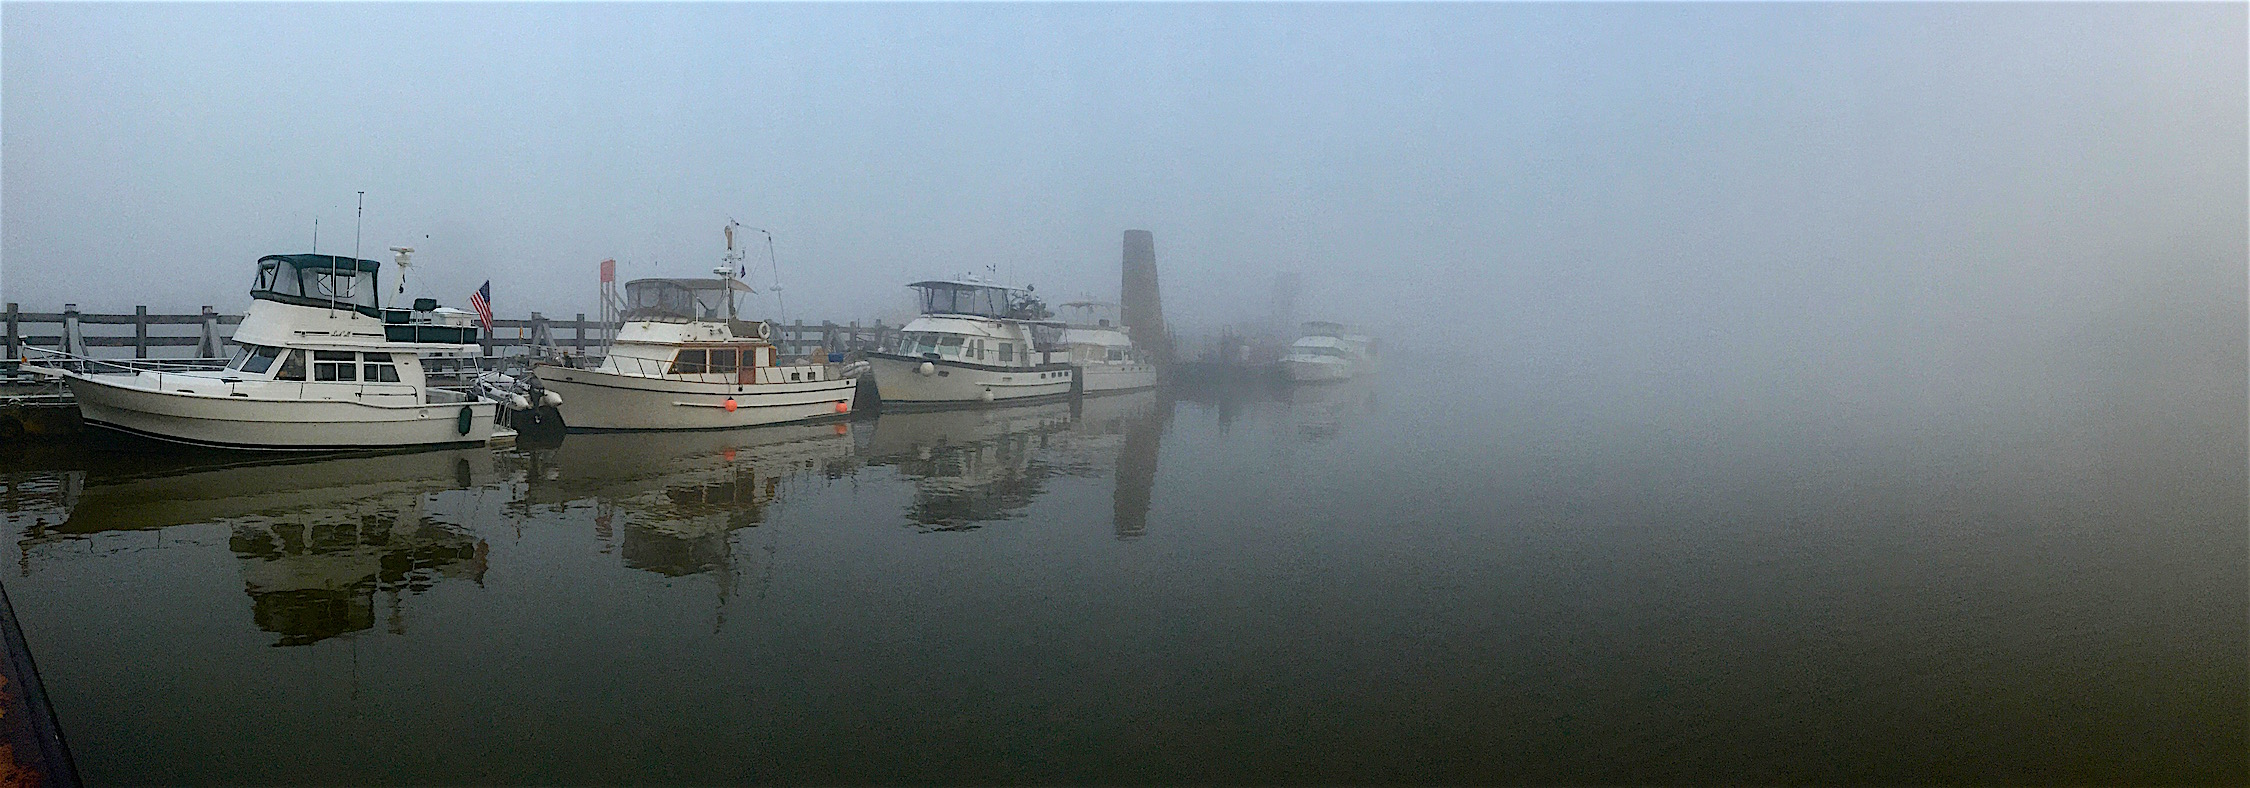 Morning fog at Kaskaskia Lock wall